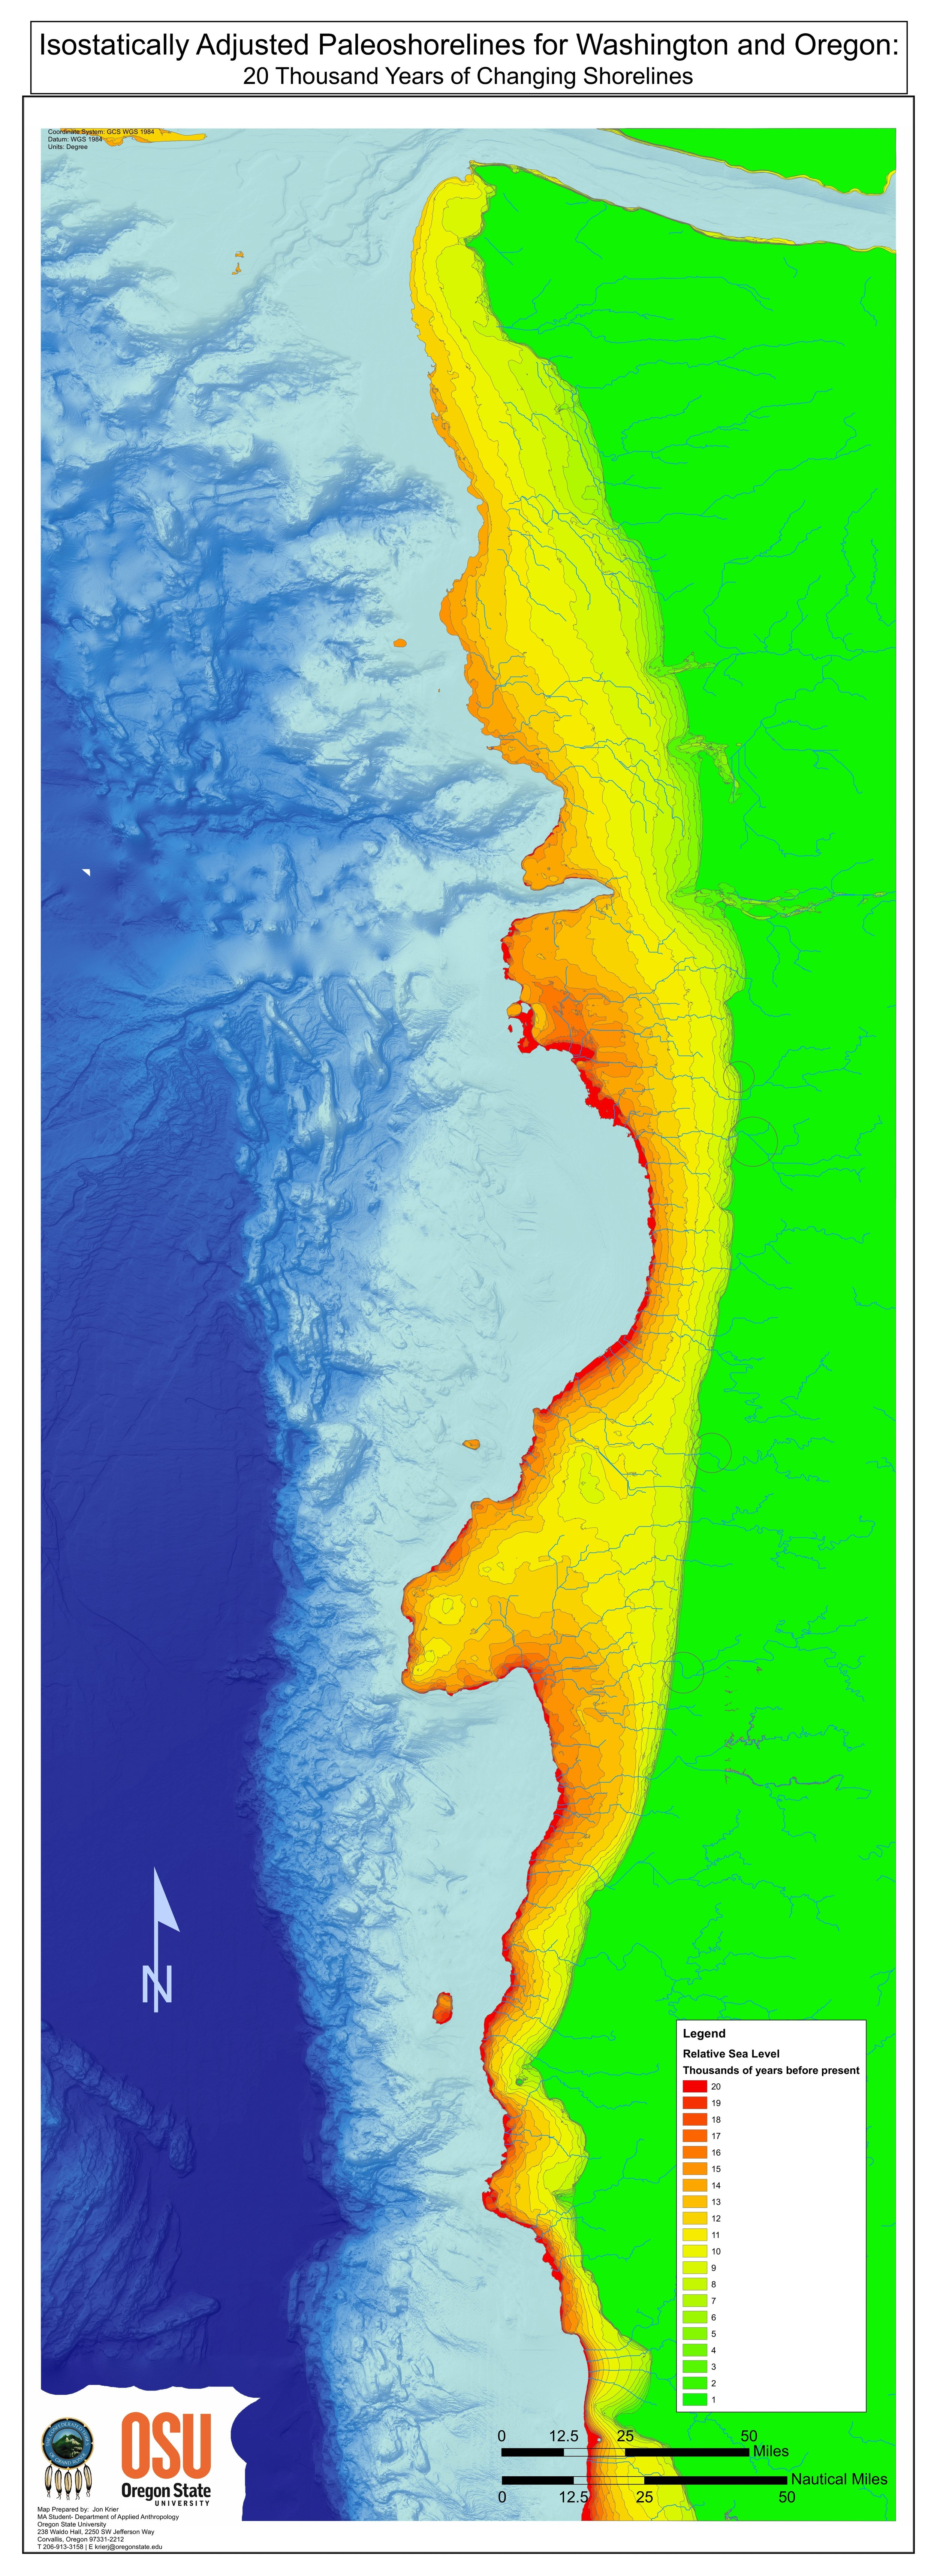 20_Thousand_Years_of_Shorelines-1.jpg